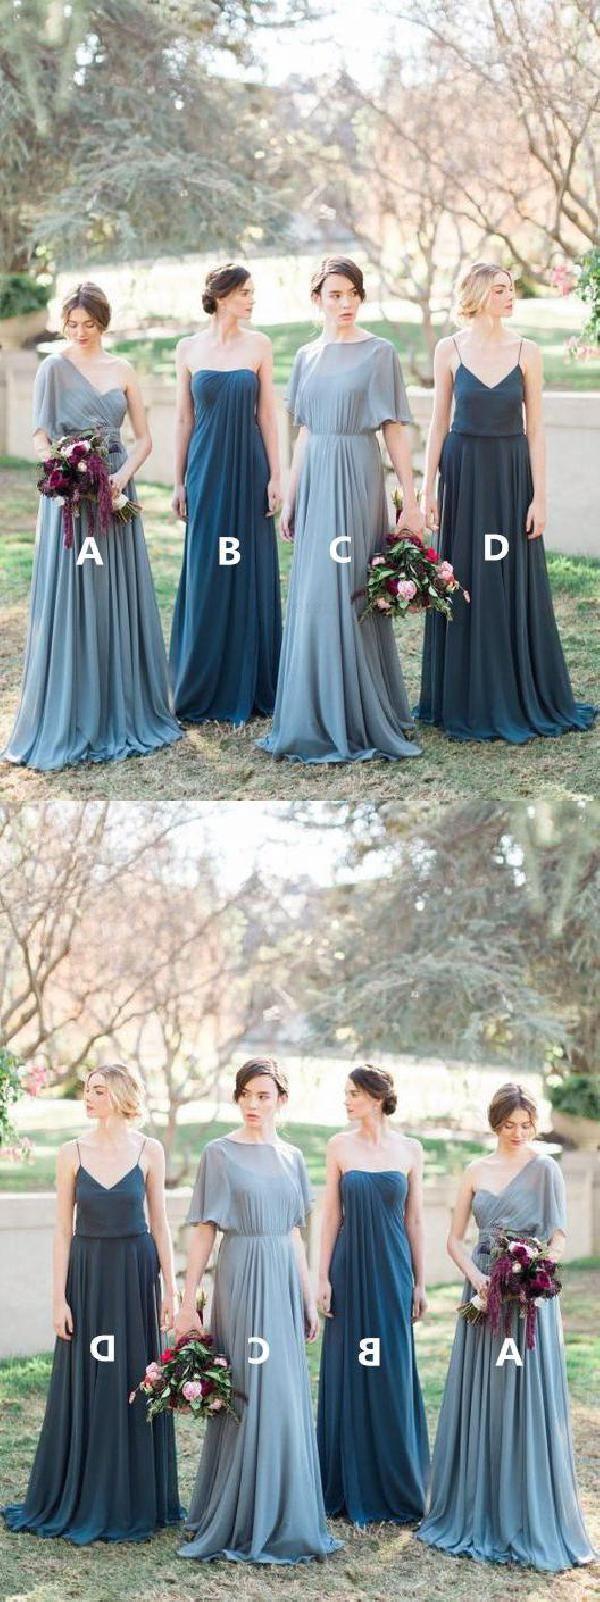 Suitable navy blue bridesmaid dress grey bridesmaid dress in